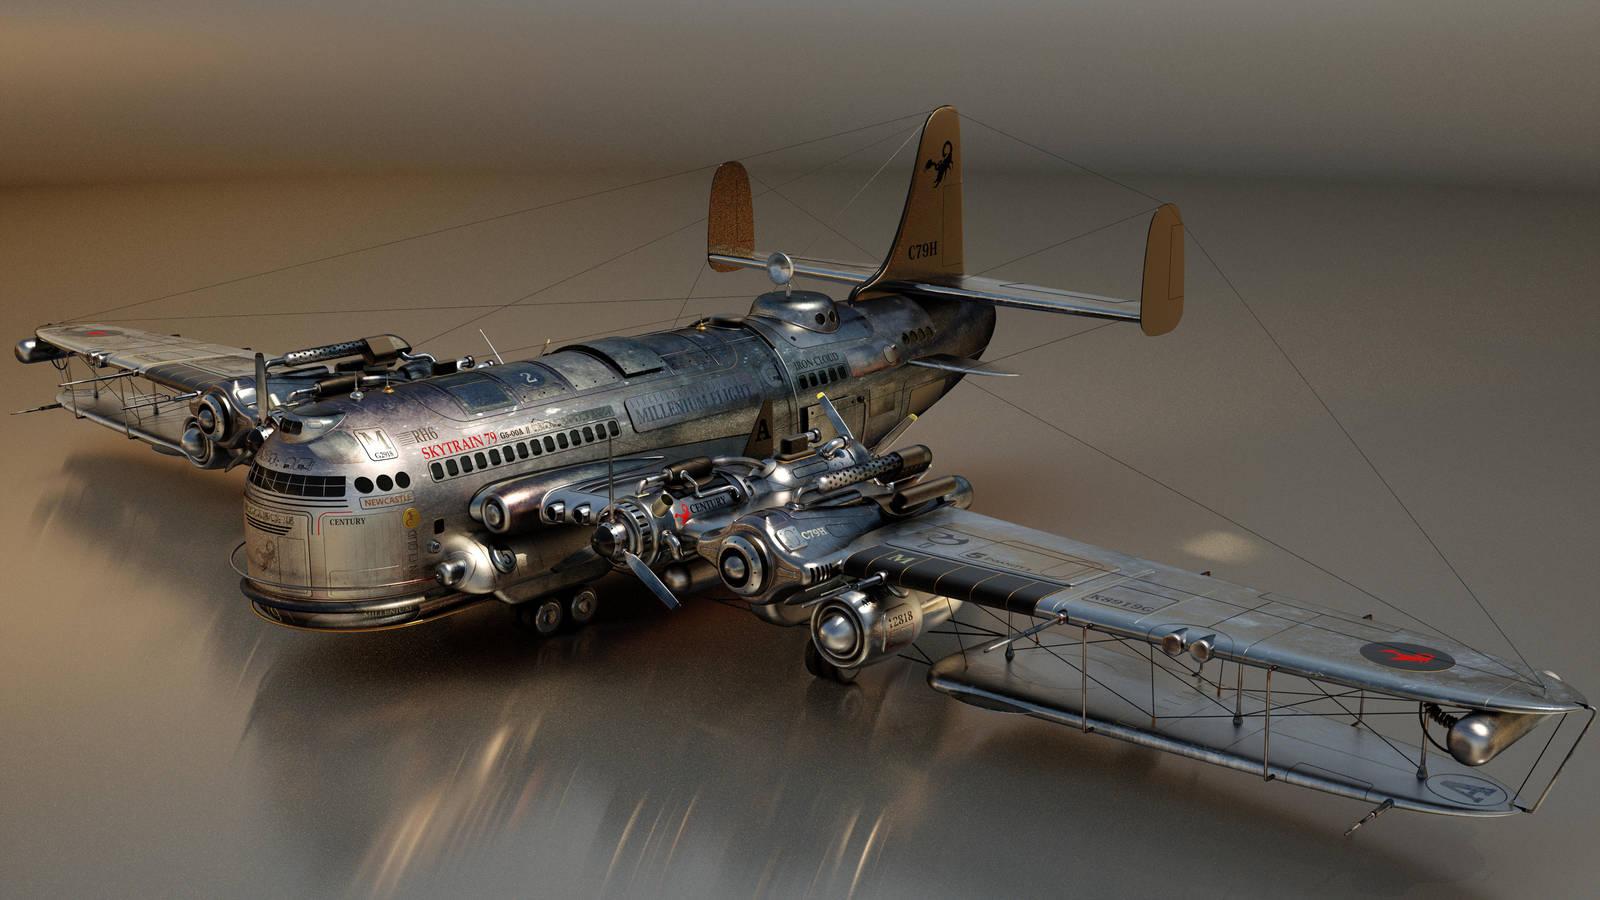 An Awkward Aeroplane by kceg